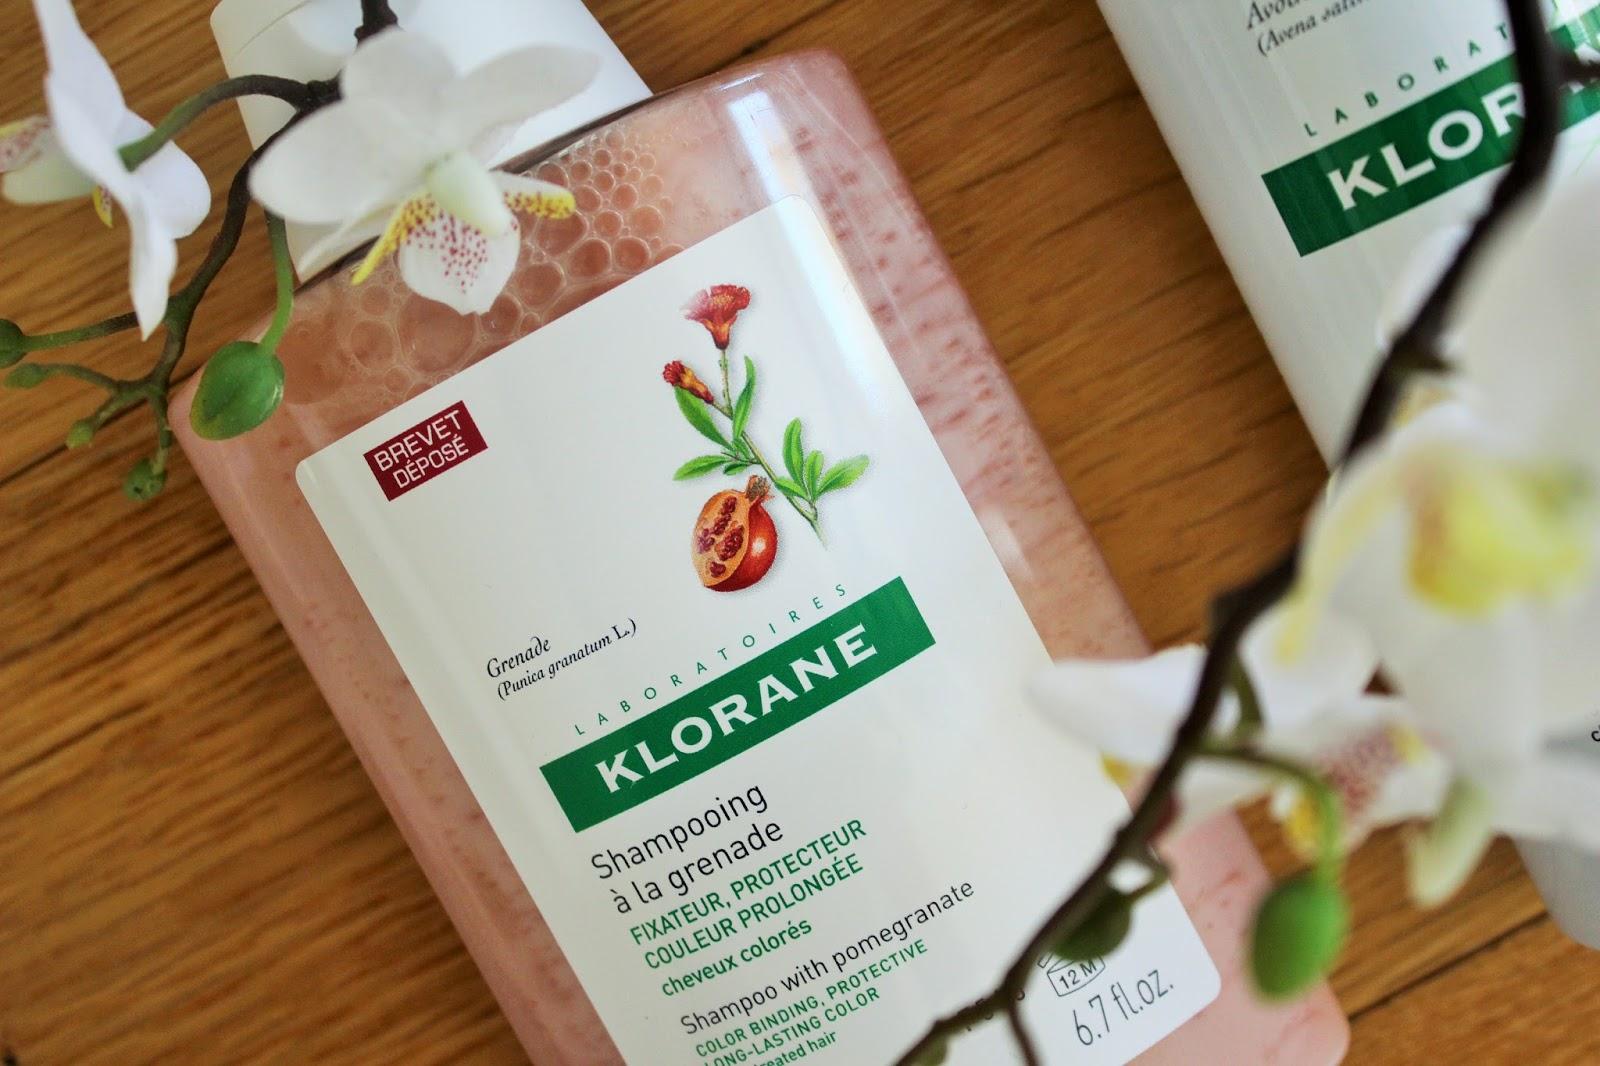 Klorane Shampoos 5 - Pomegranate Shampoo